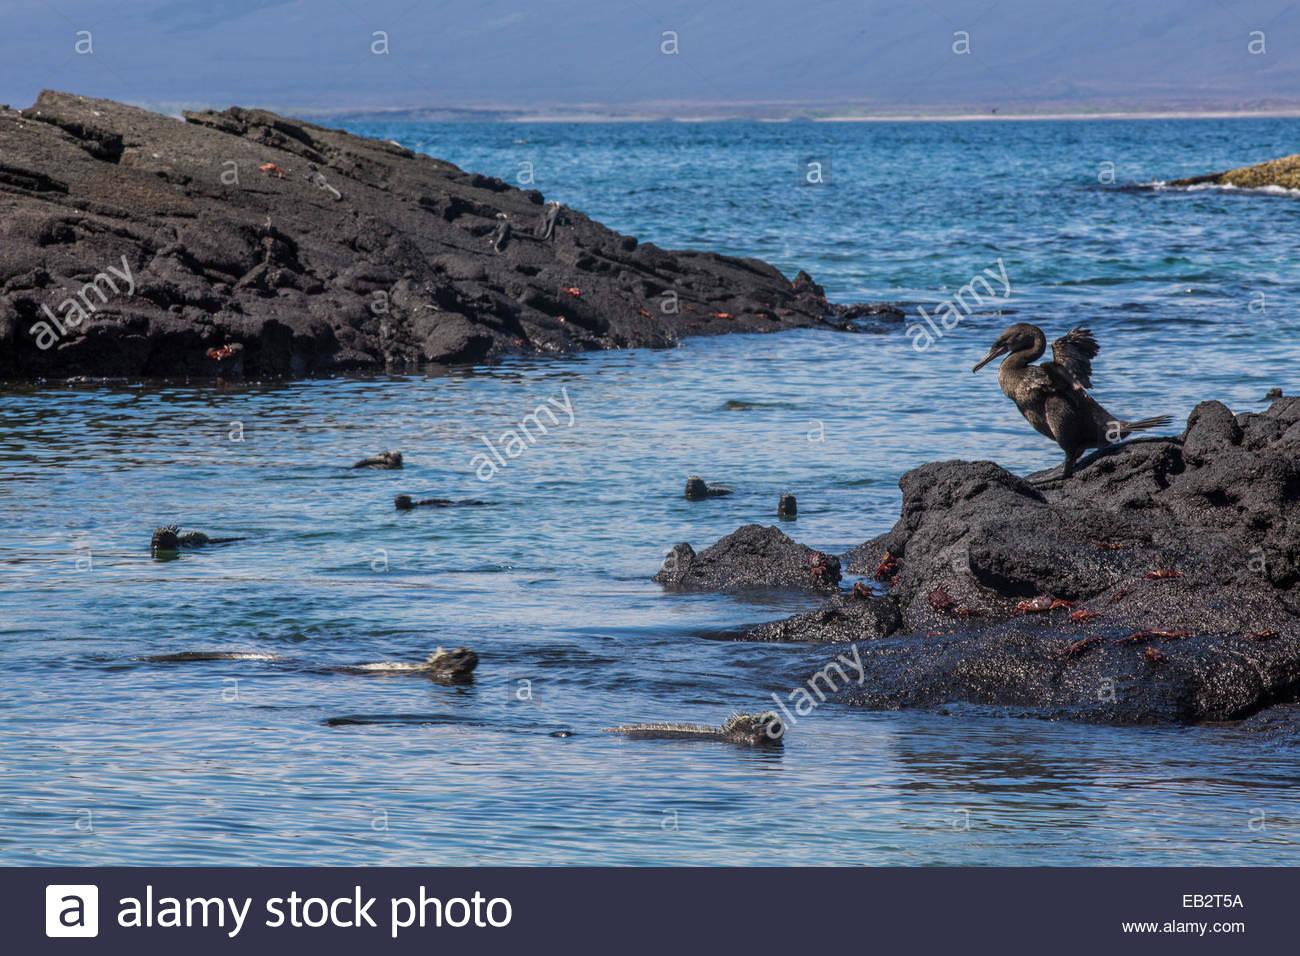 A flightless cormorant watches marine iguanas swim at Punta Espinoza on Fernandina Island in Galapagos National - Stock Image